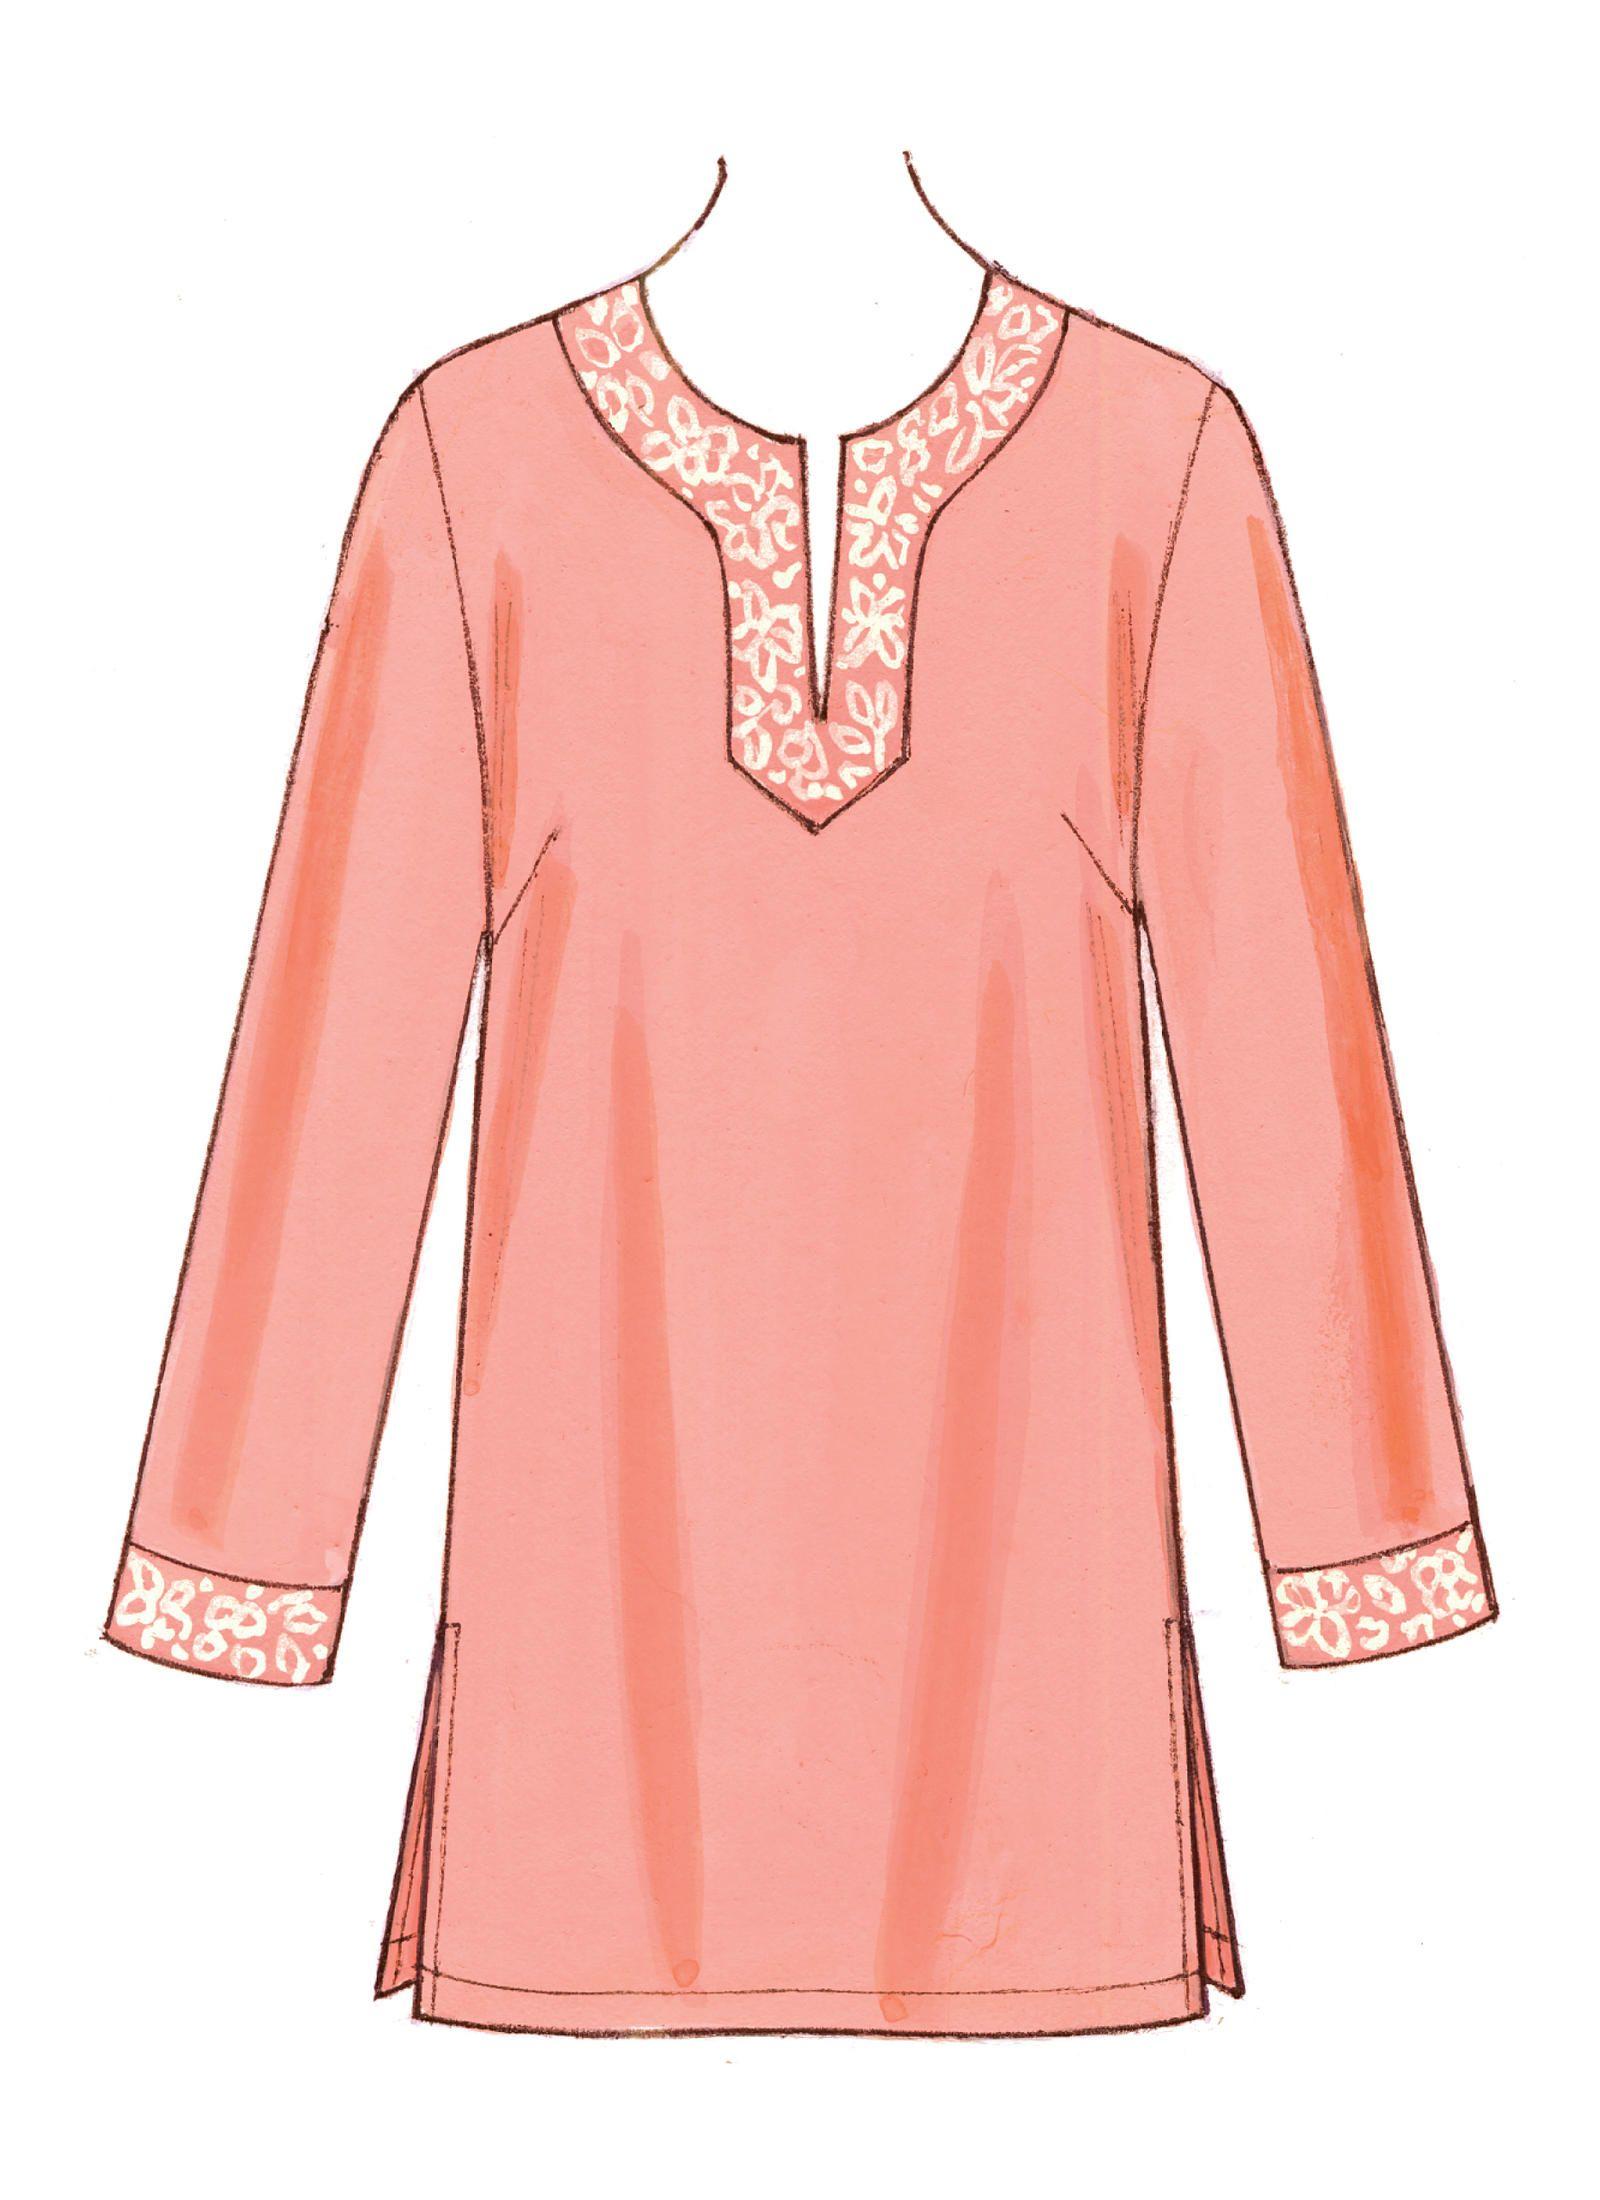 K3601 | Kwik Sew Patterns | Clothing ideas | Pinterest